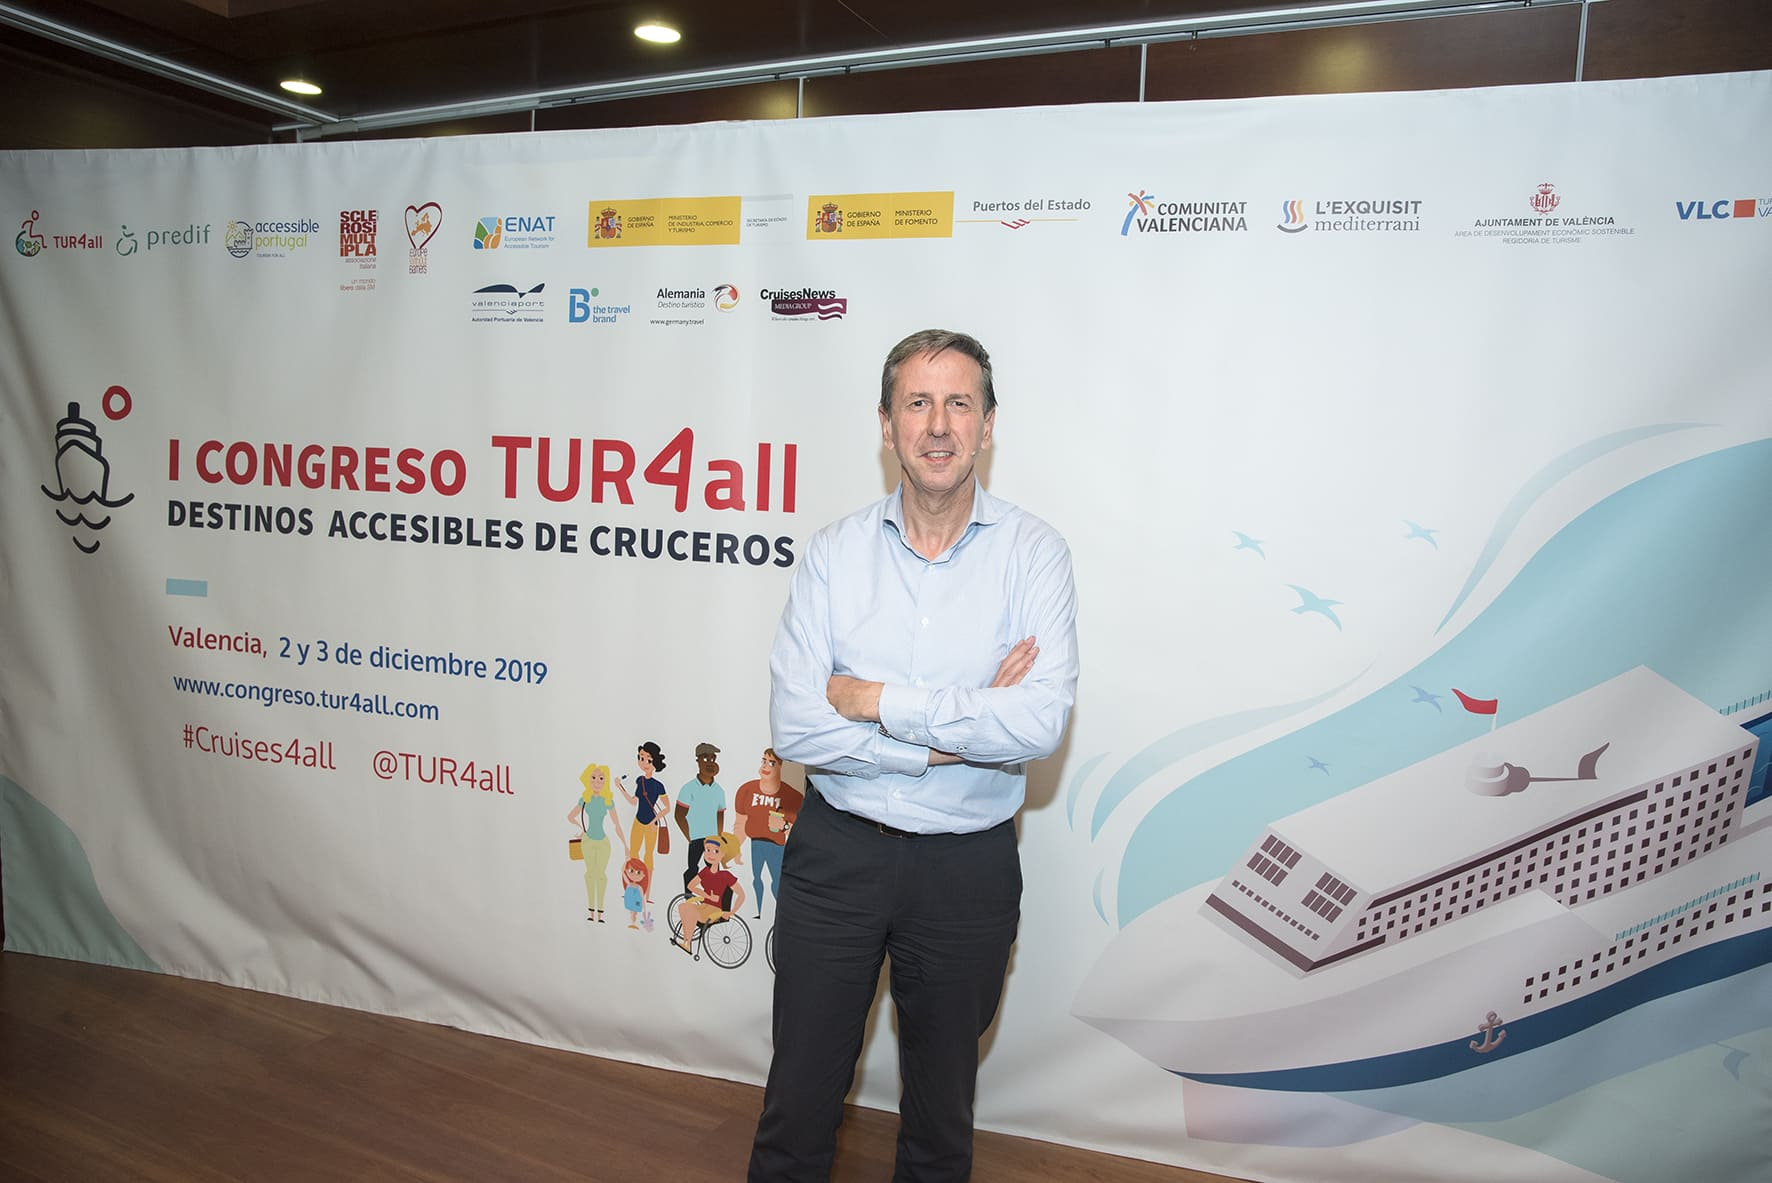 José Luis Wagner_Turisme Comunitat Valenciana